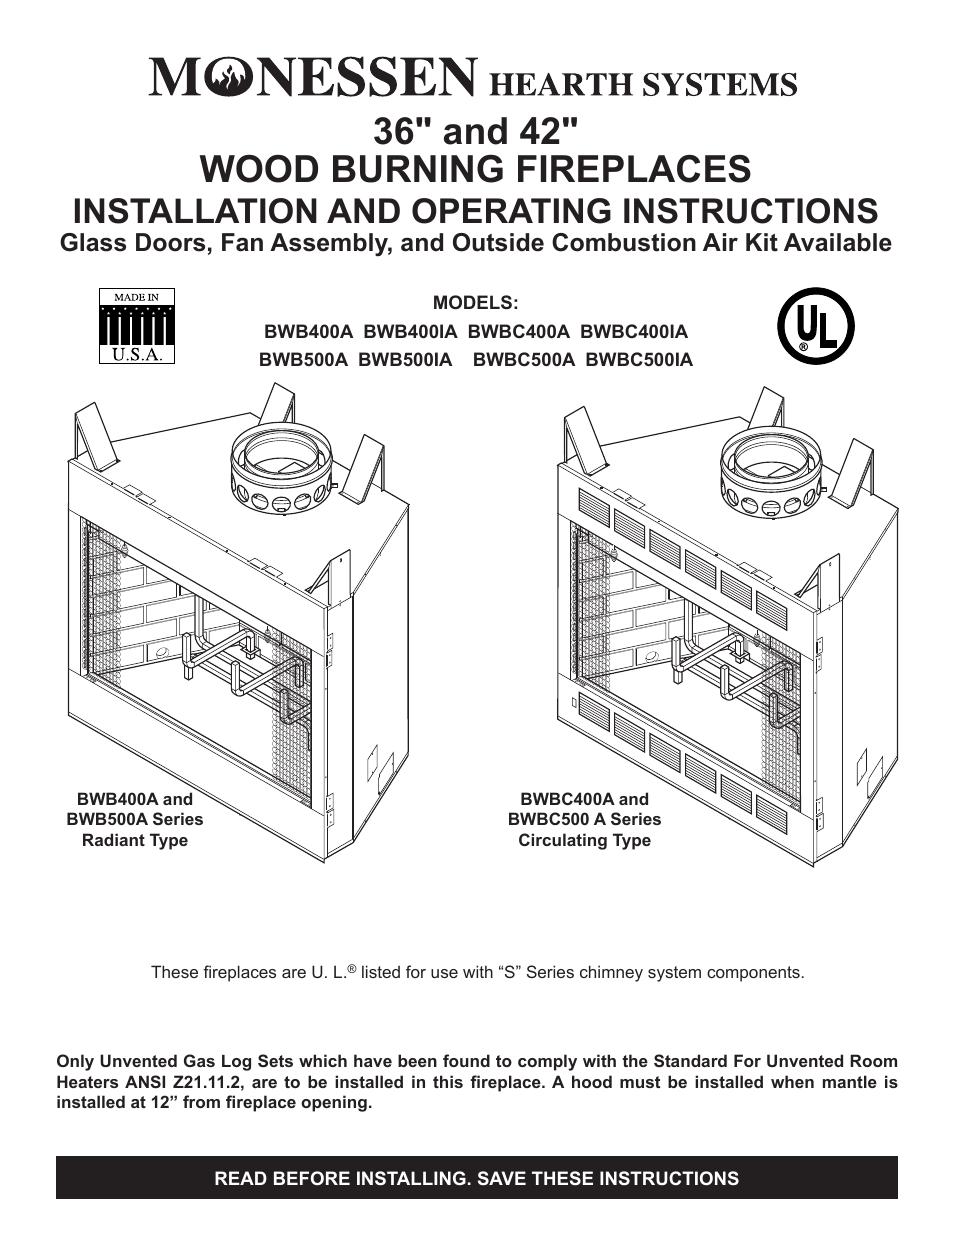 Wood Burning Fireplaces Manual Guide